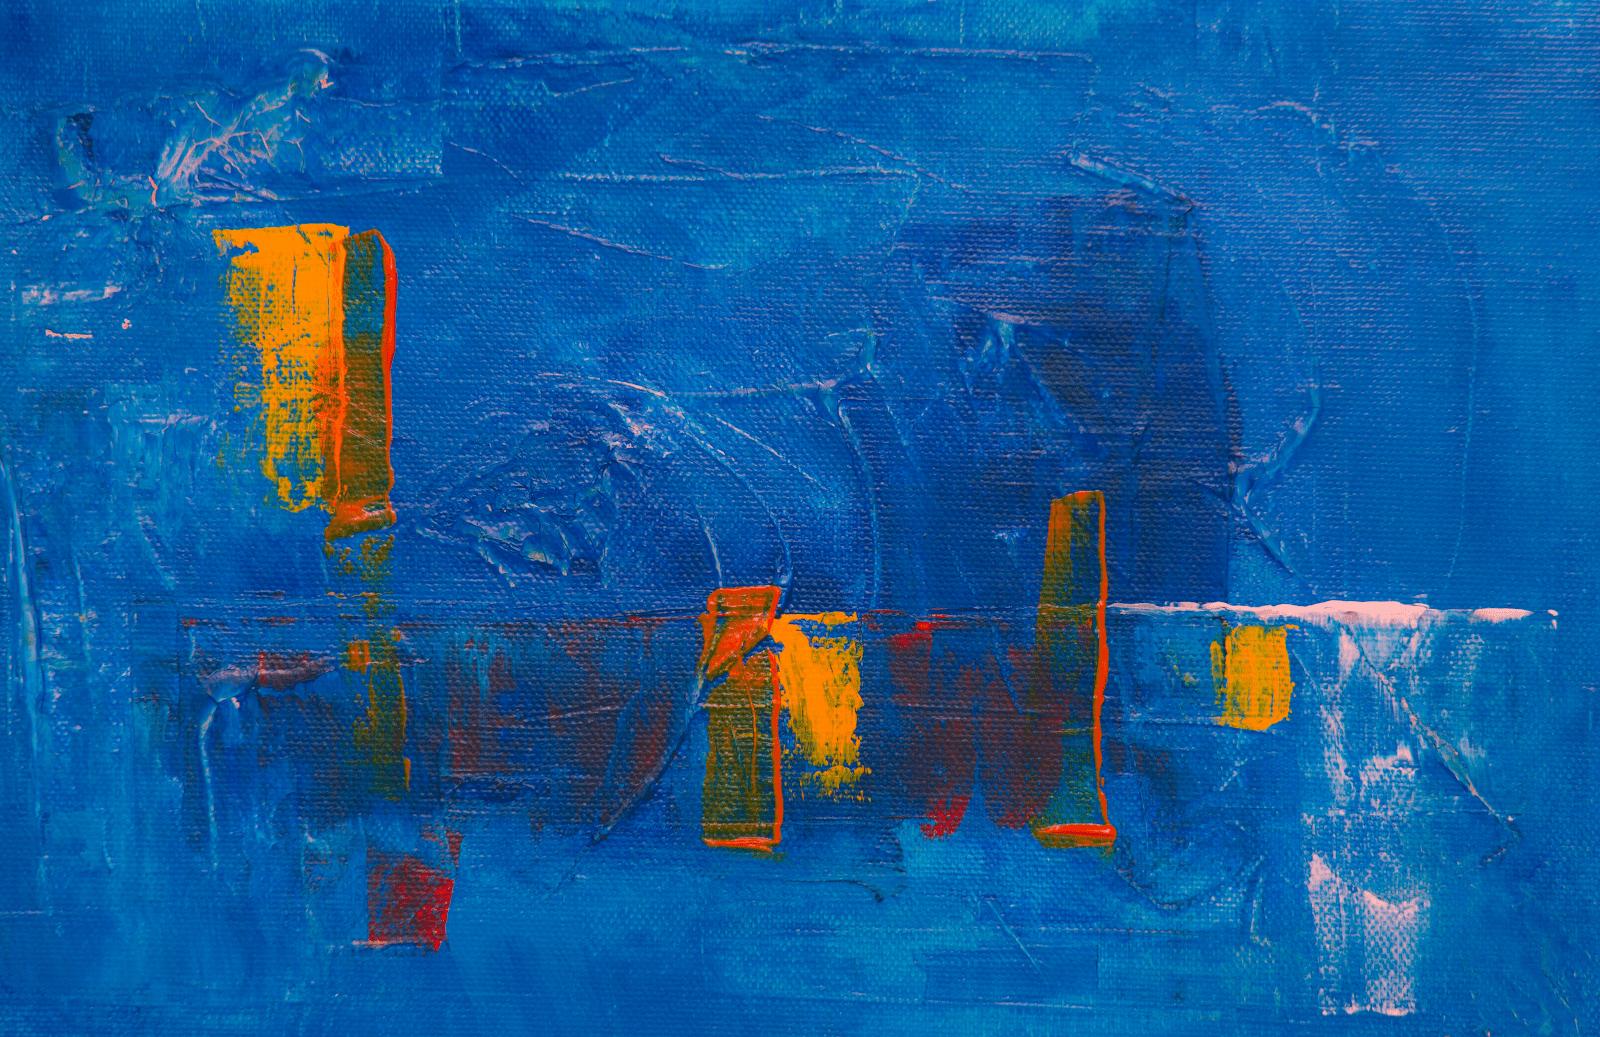 blue acrylic painting with orange tones